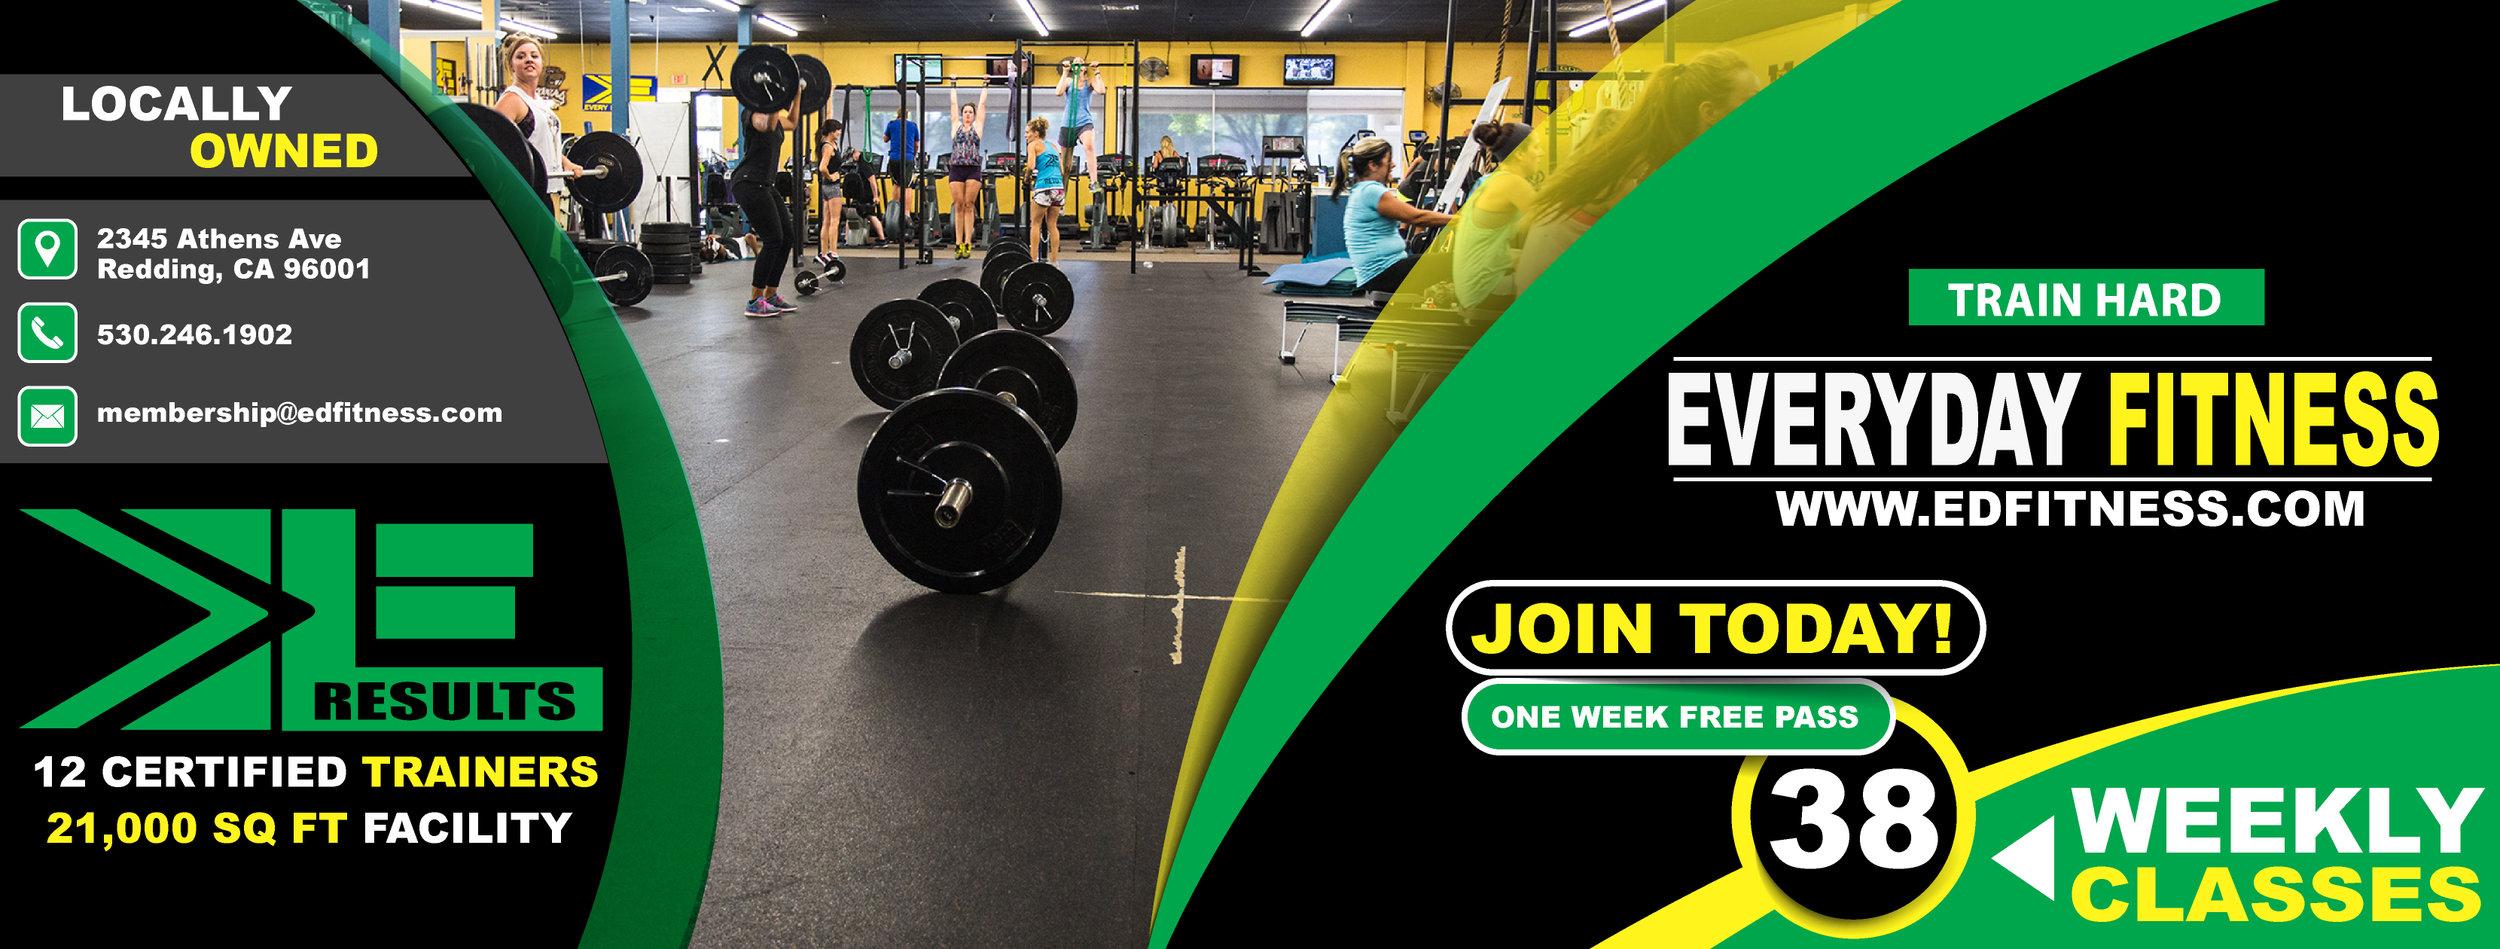 EveryDay Fitness Redding Ca.jpg